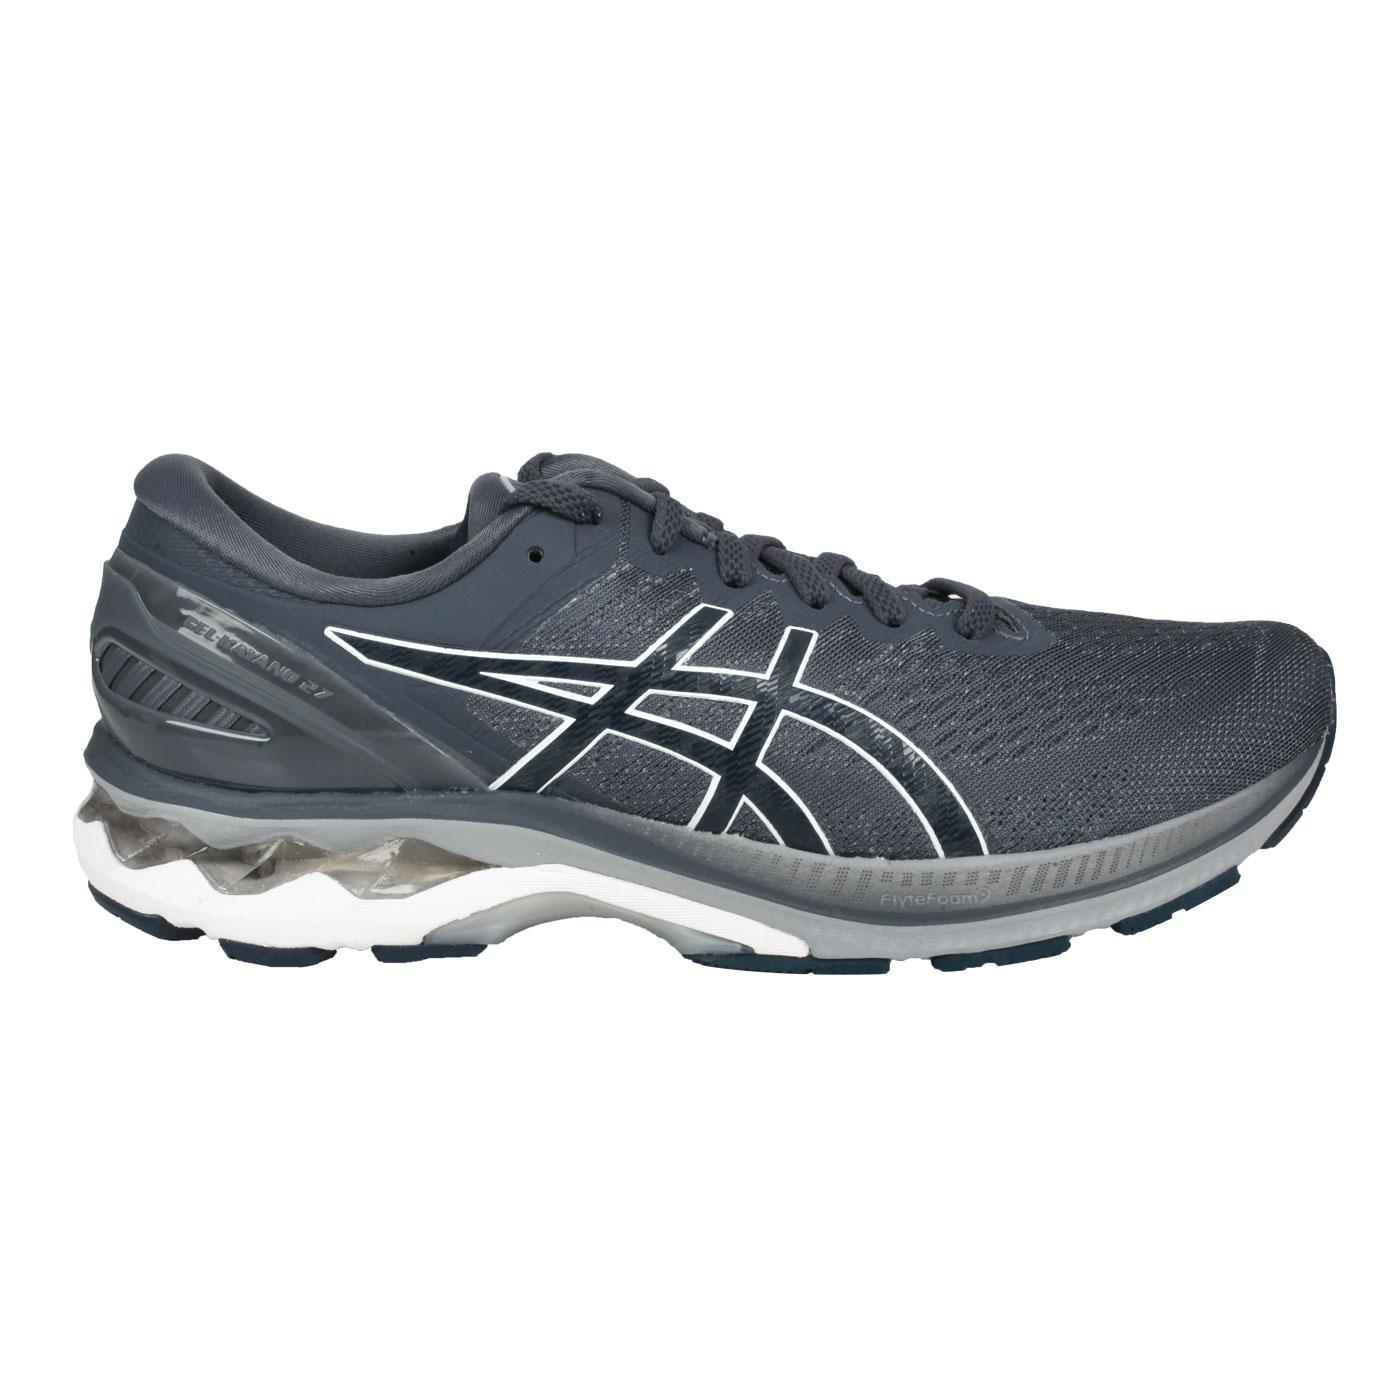 ASICS 男款慢跑鞋  @GEL-KAYANO 27@1011A767-023